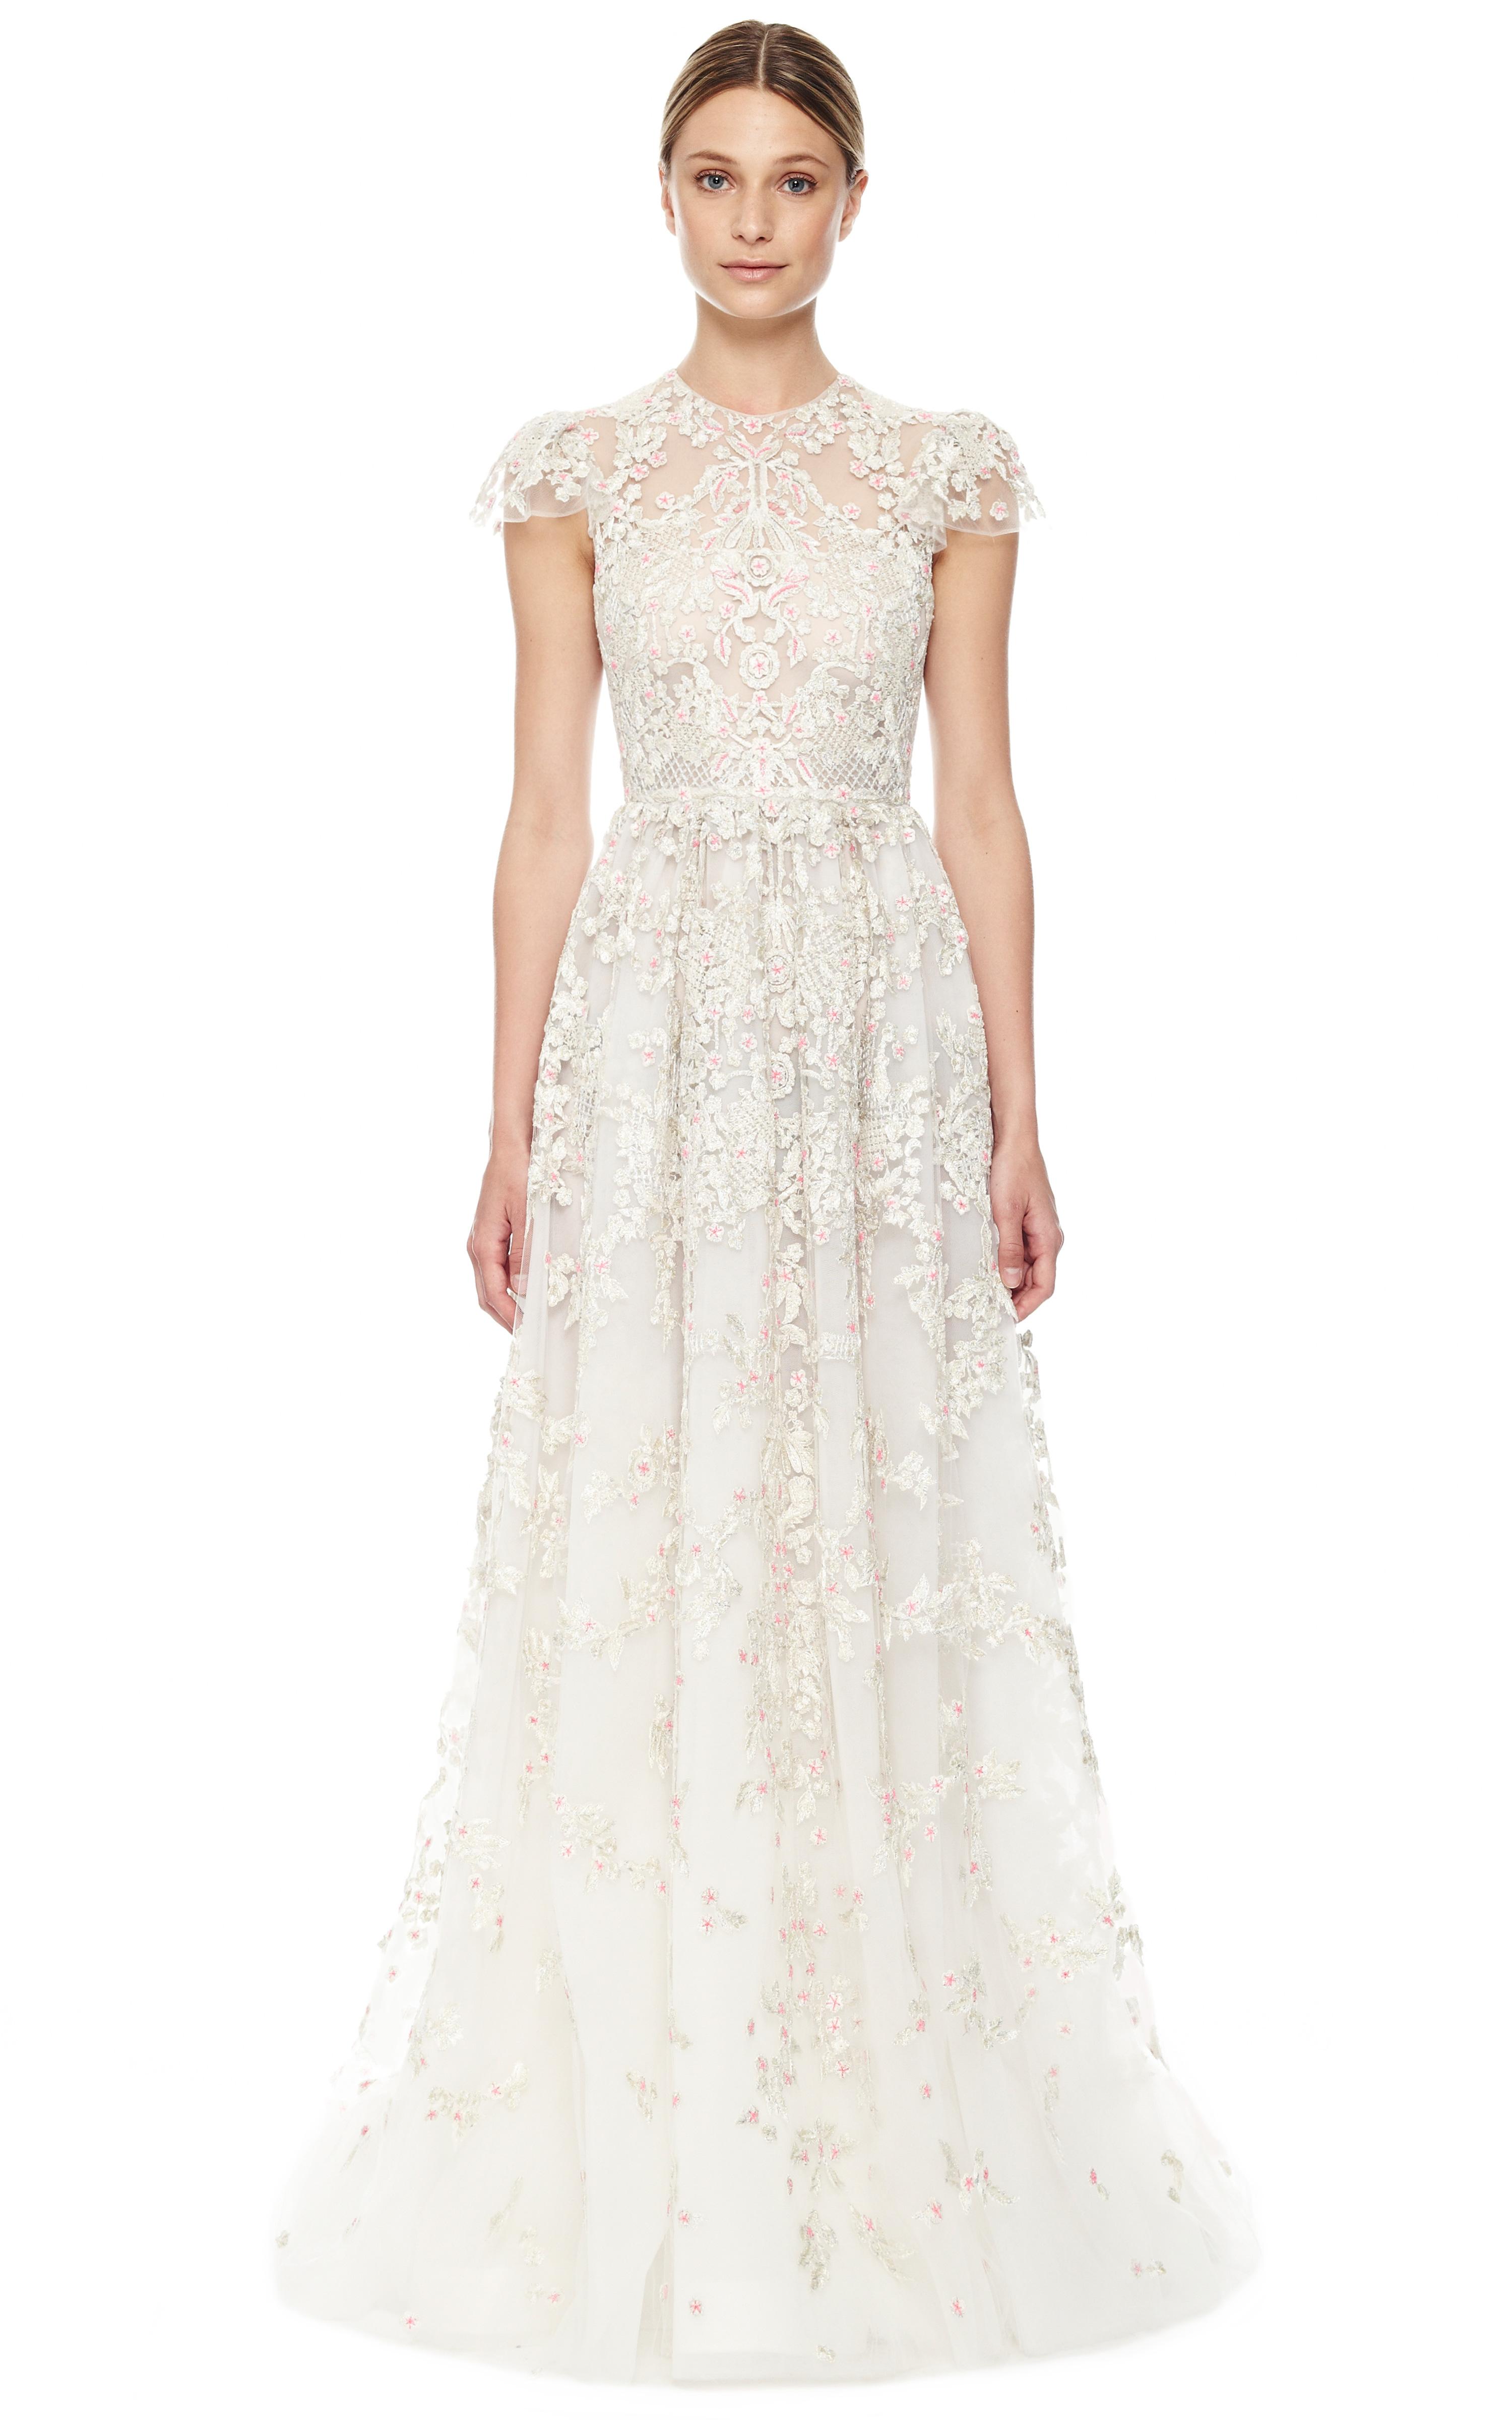 Lyst - Valentino Avorio Multi Tulle Illusione Gown in White